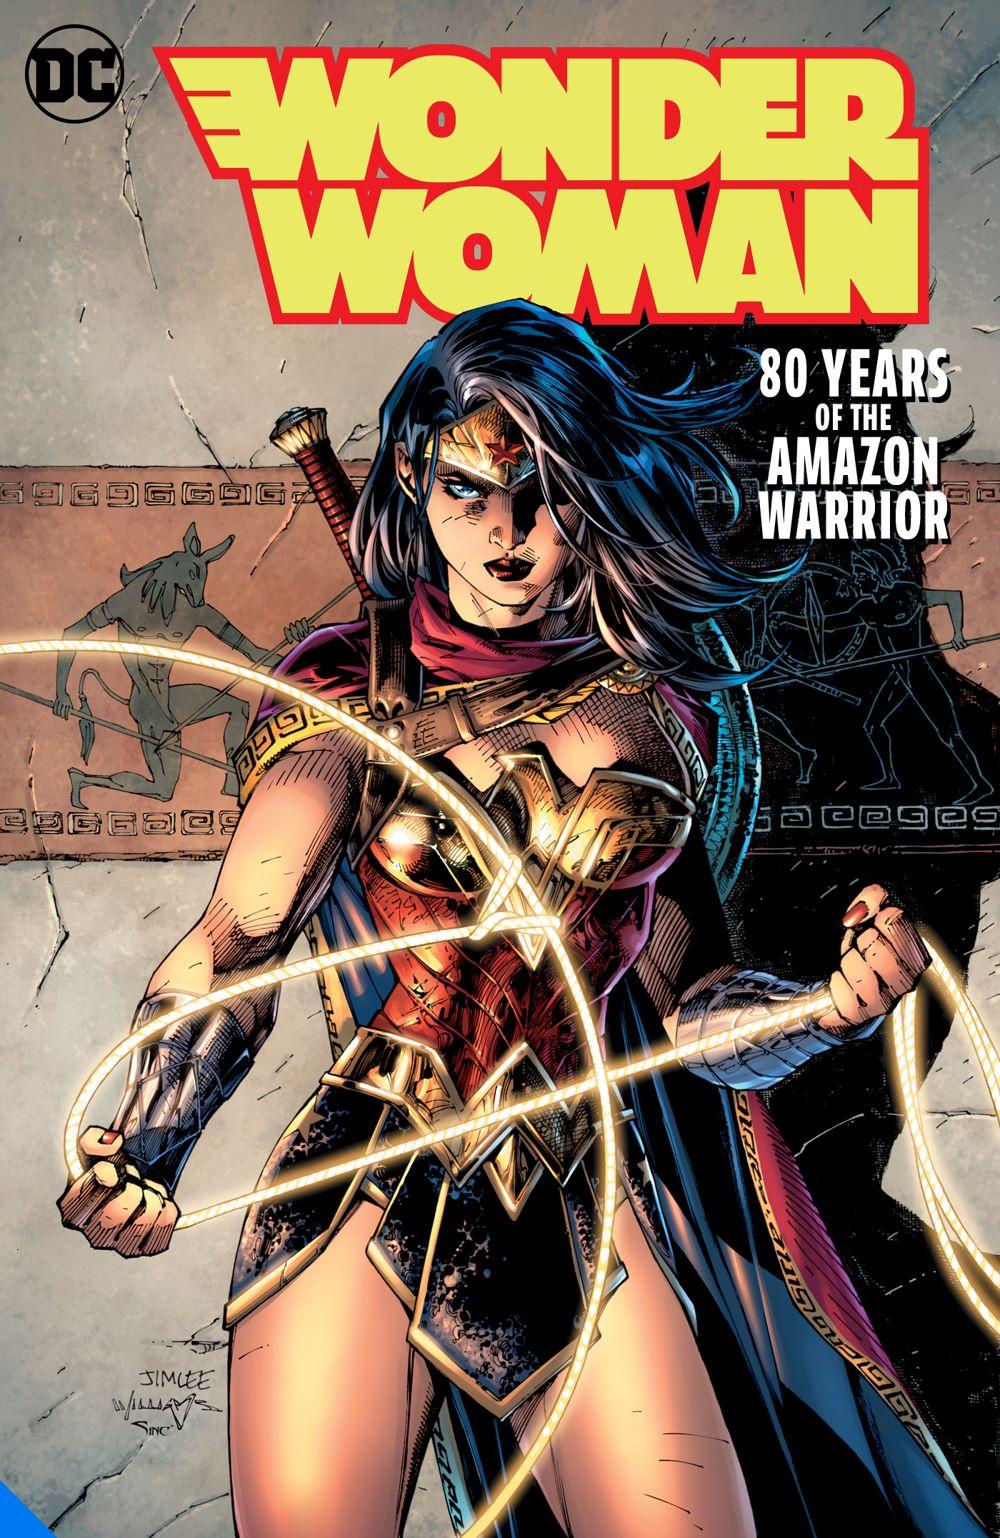 ww80yrsoftheamazonwarrior-dlx_adv DC Comics June 2021 Solicitations